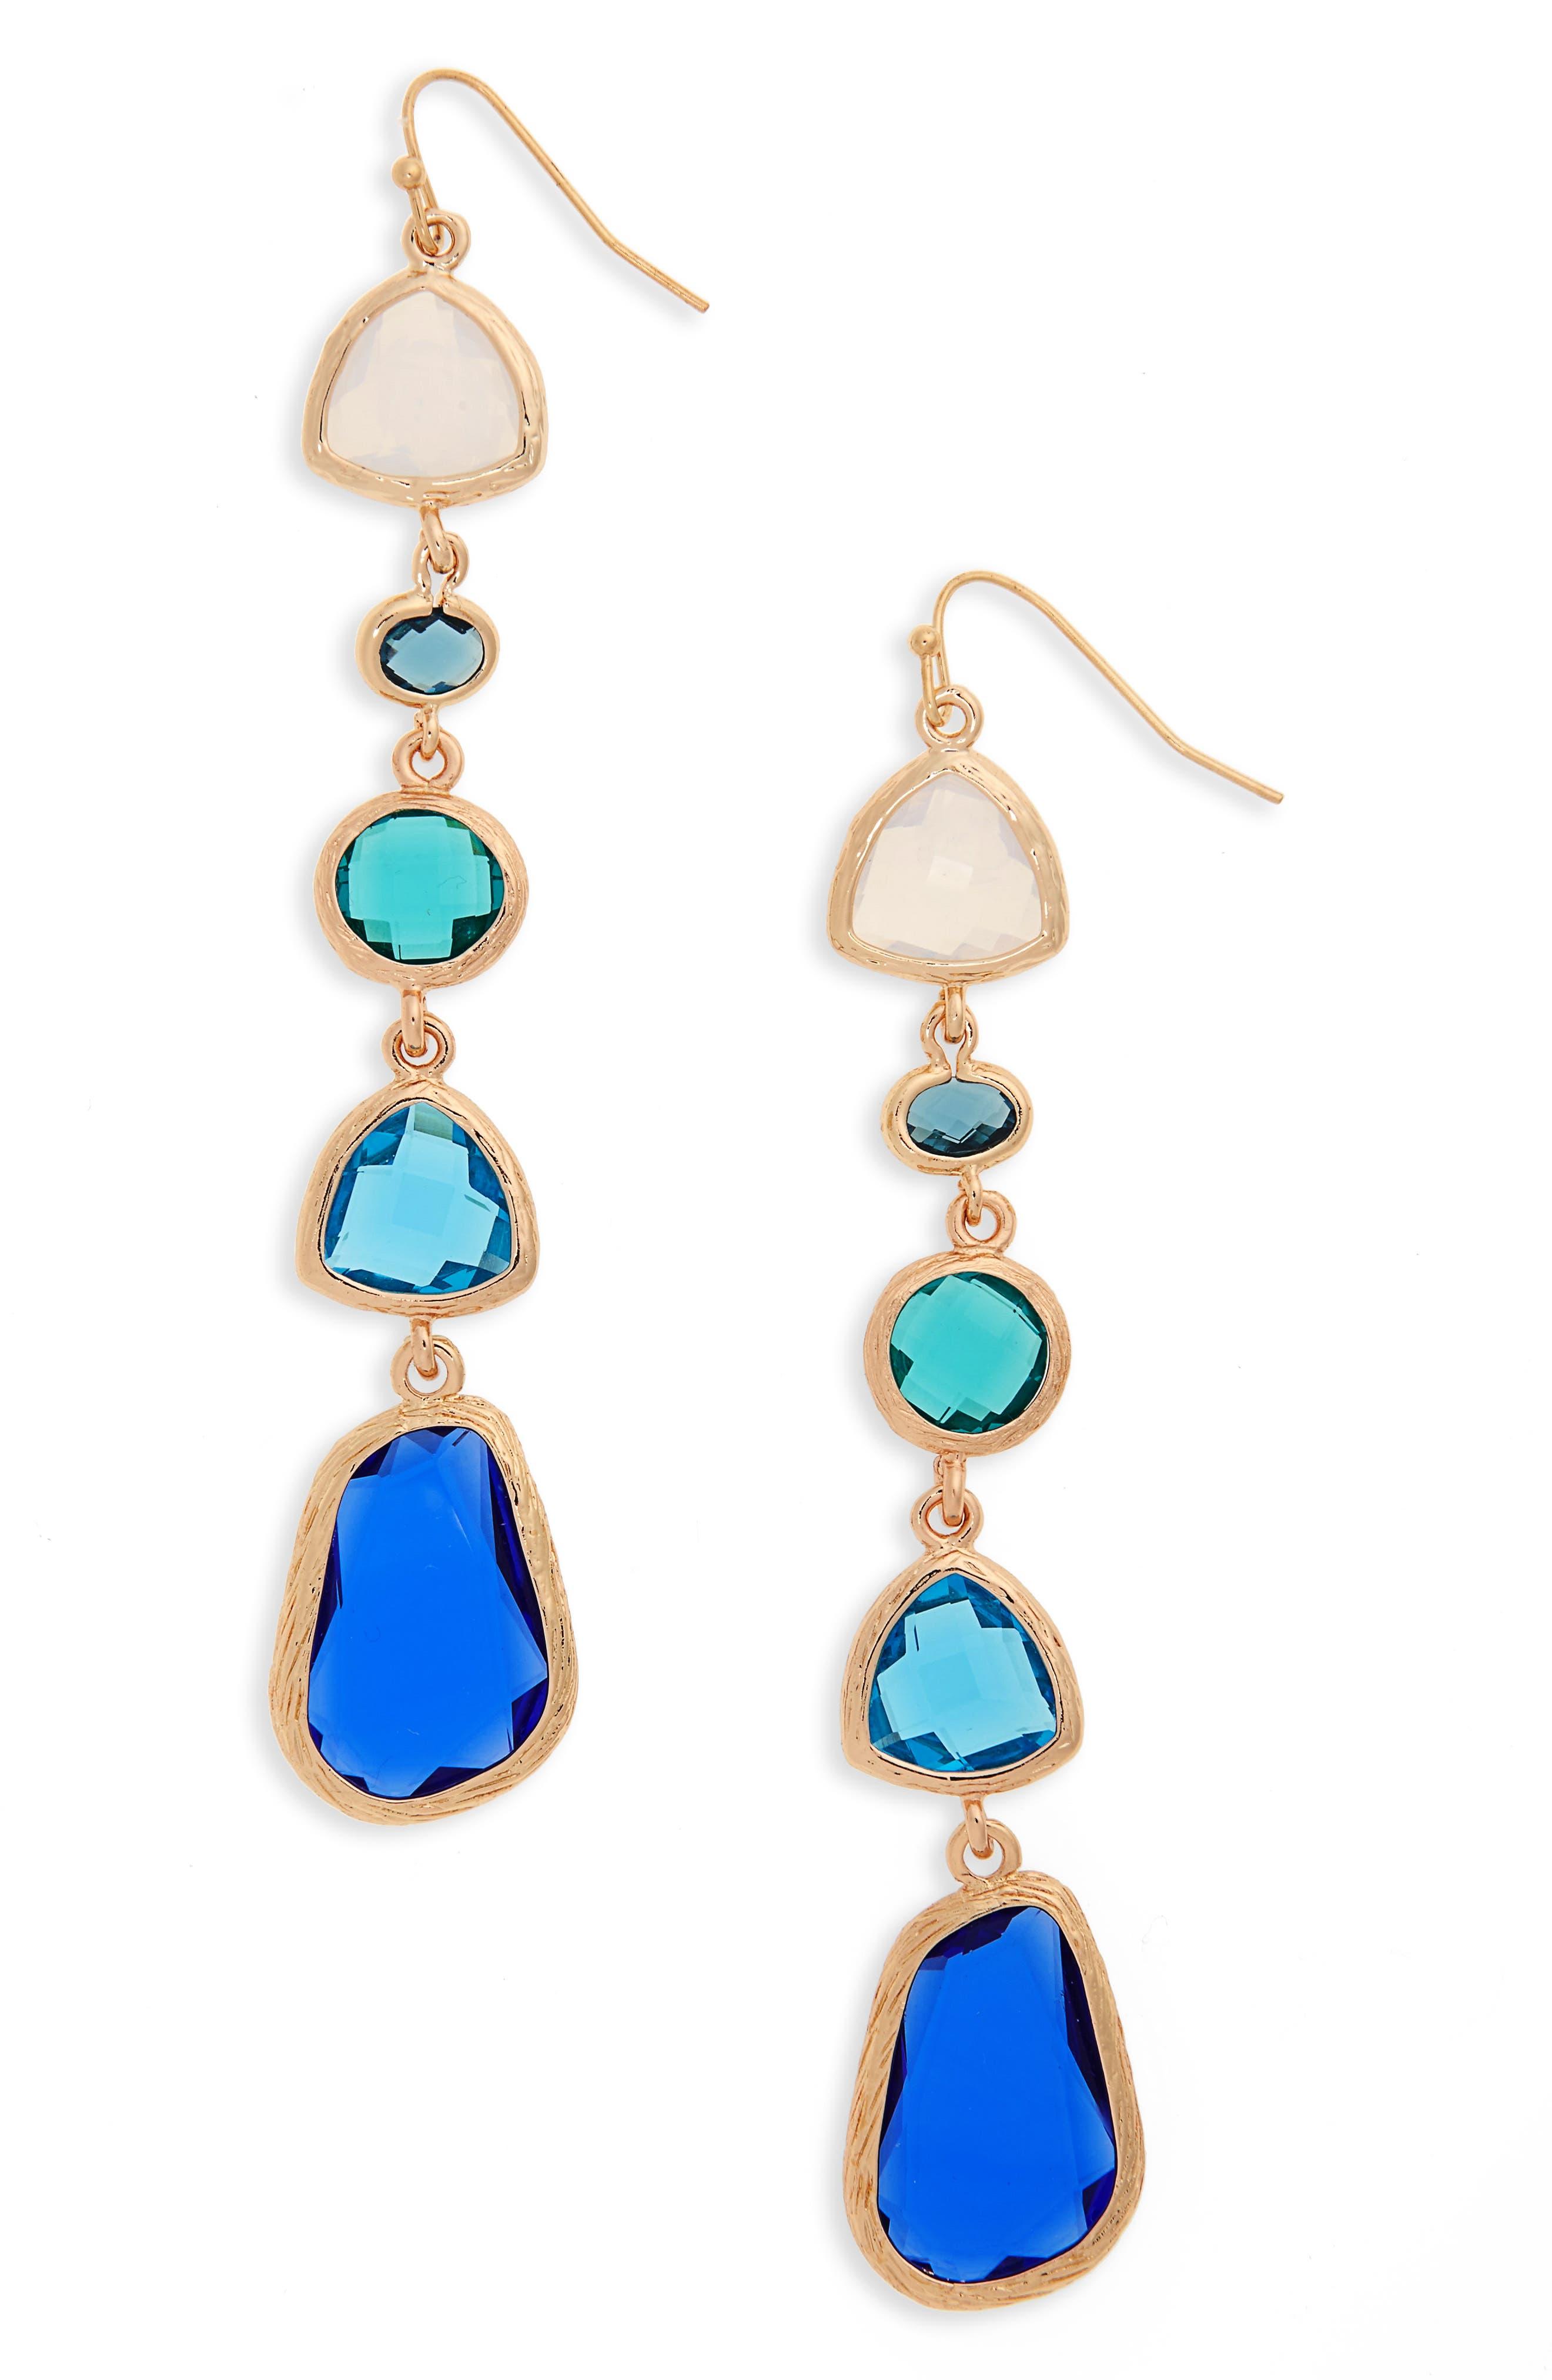 Main Image - Panacea Drop Earrings